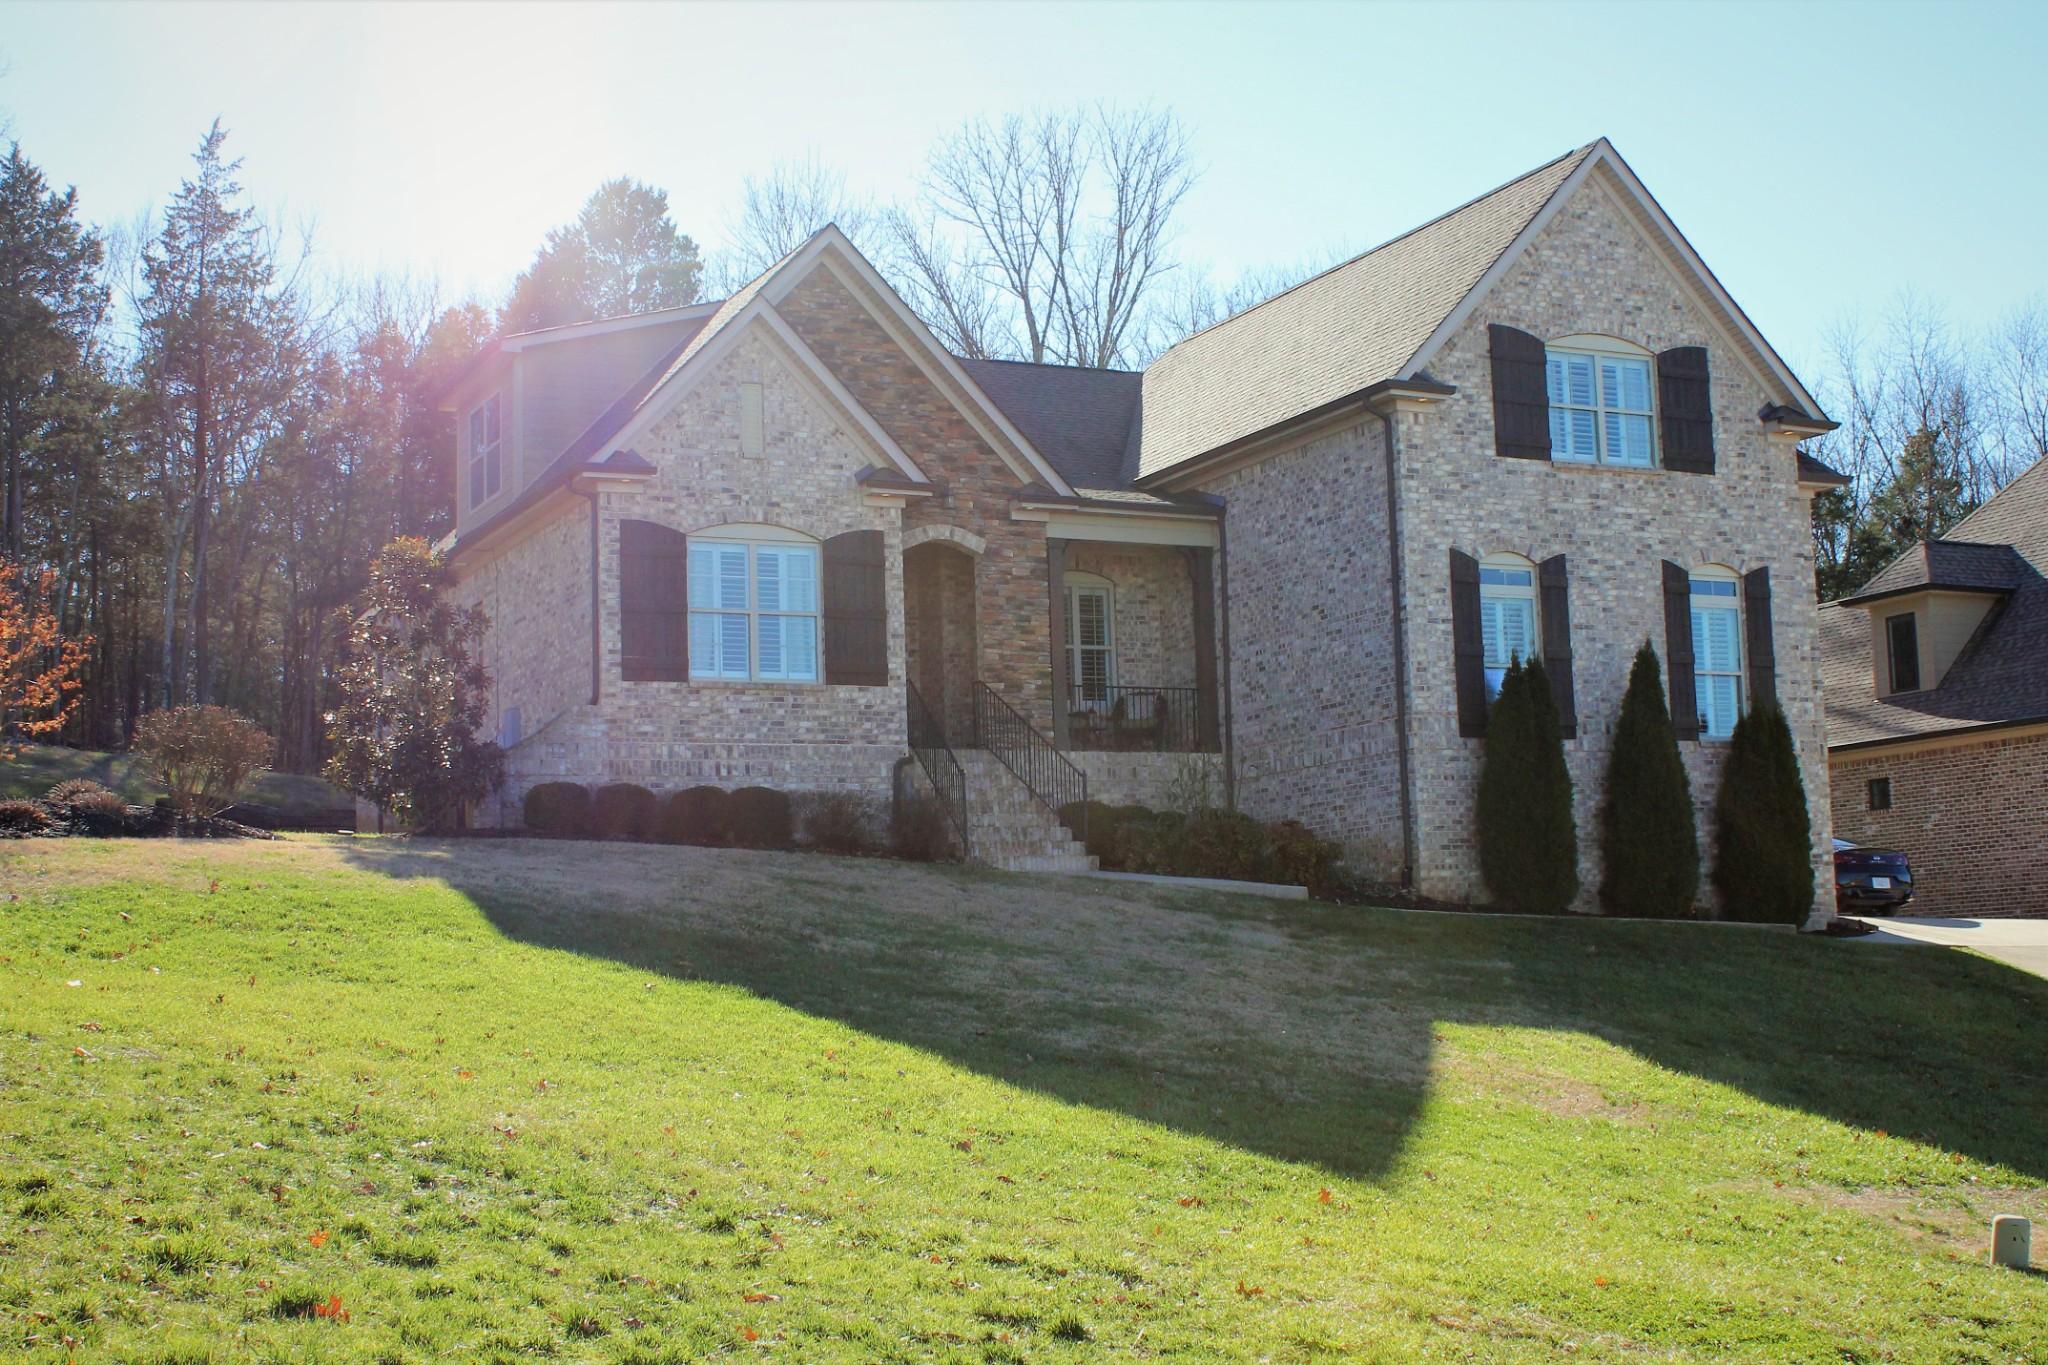 119 Ridgebend Dr, Murfreesboro, TN 37128 - Murfreesboro, TN real estate listing